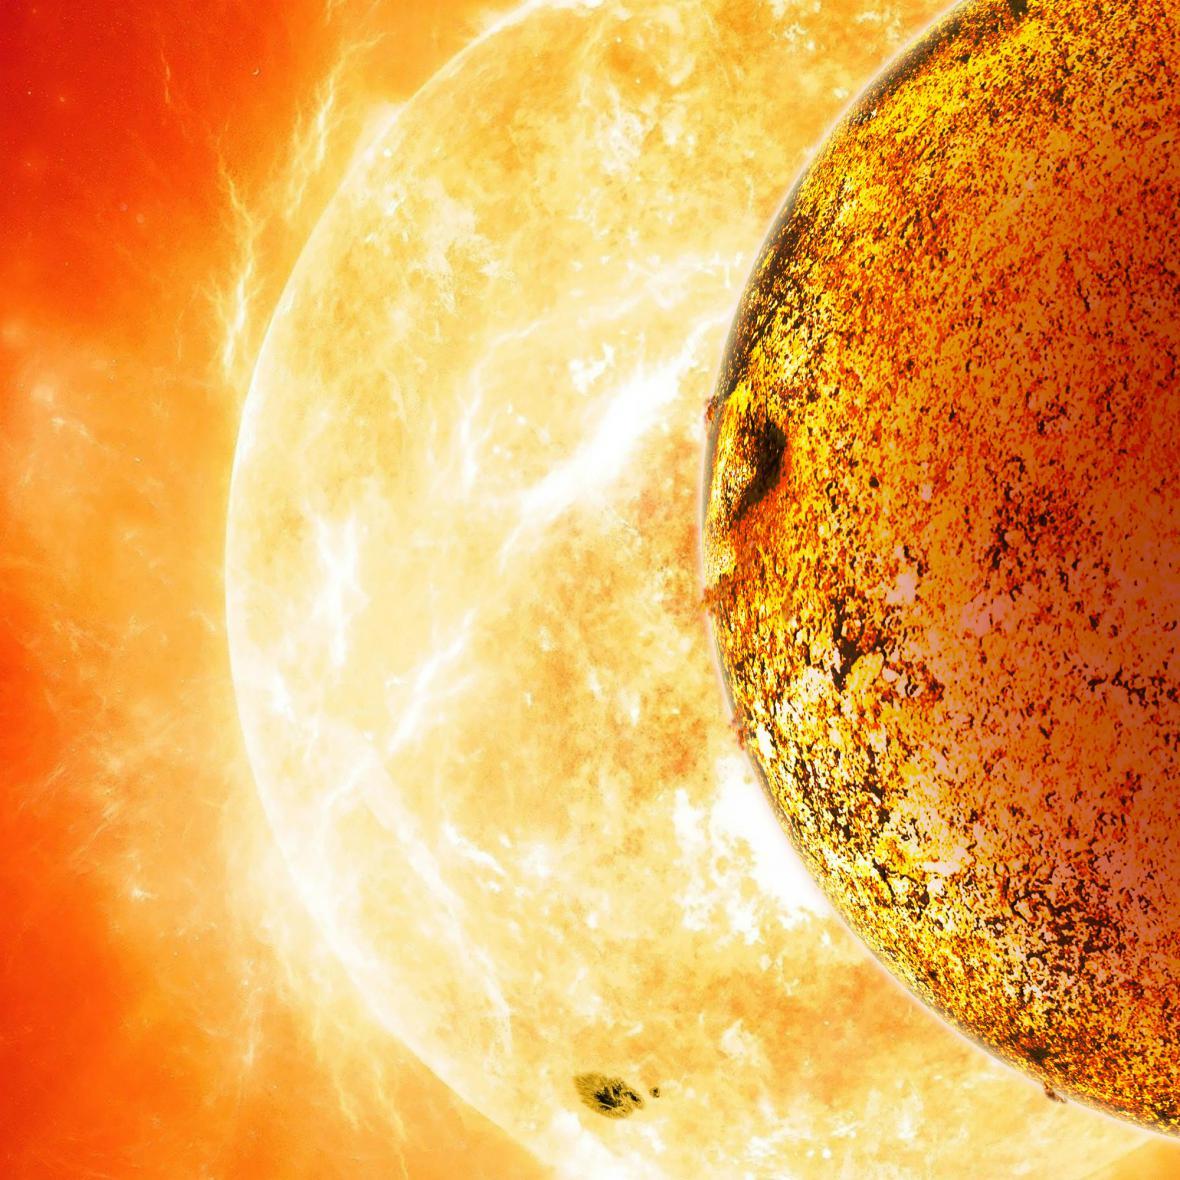 Planeta Kepler 78b